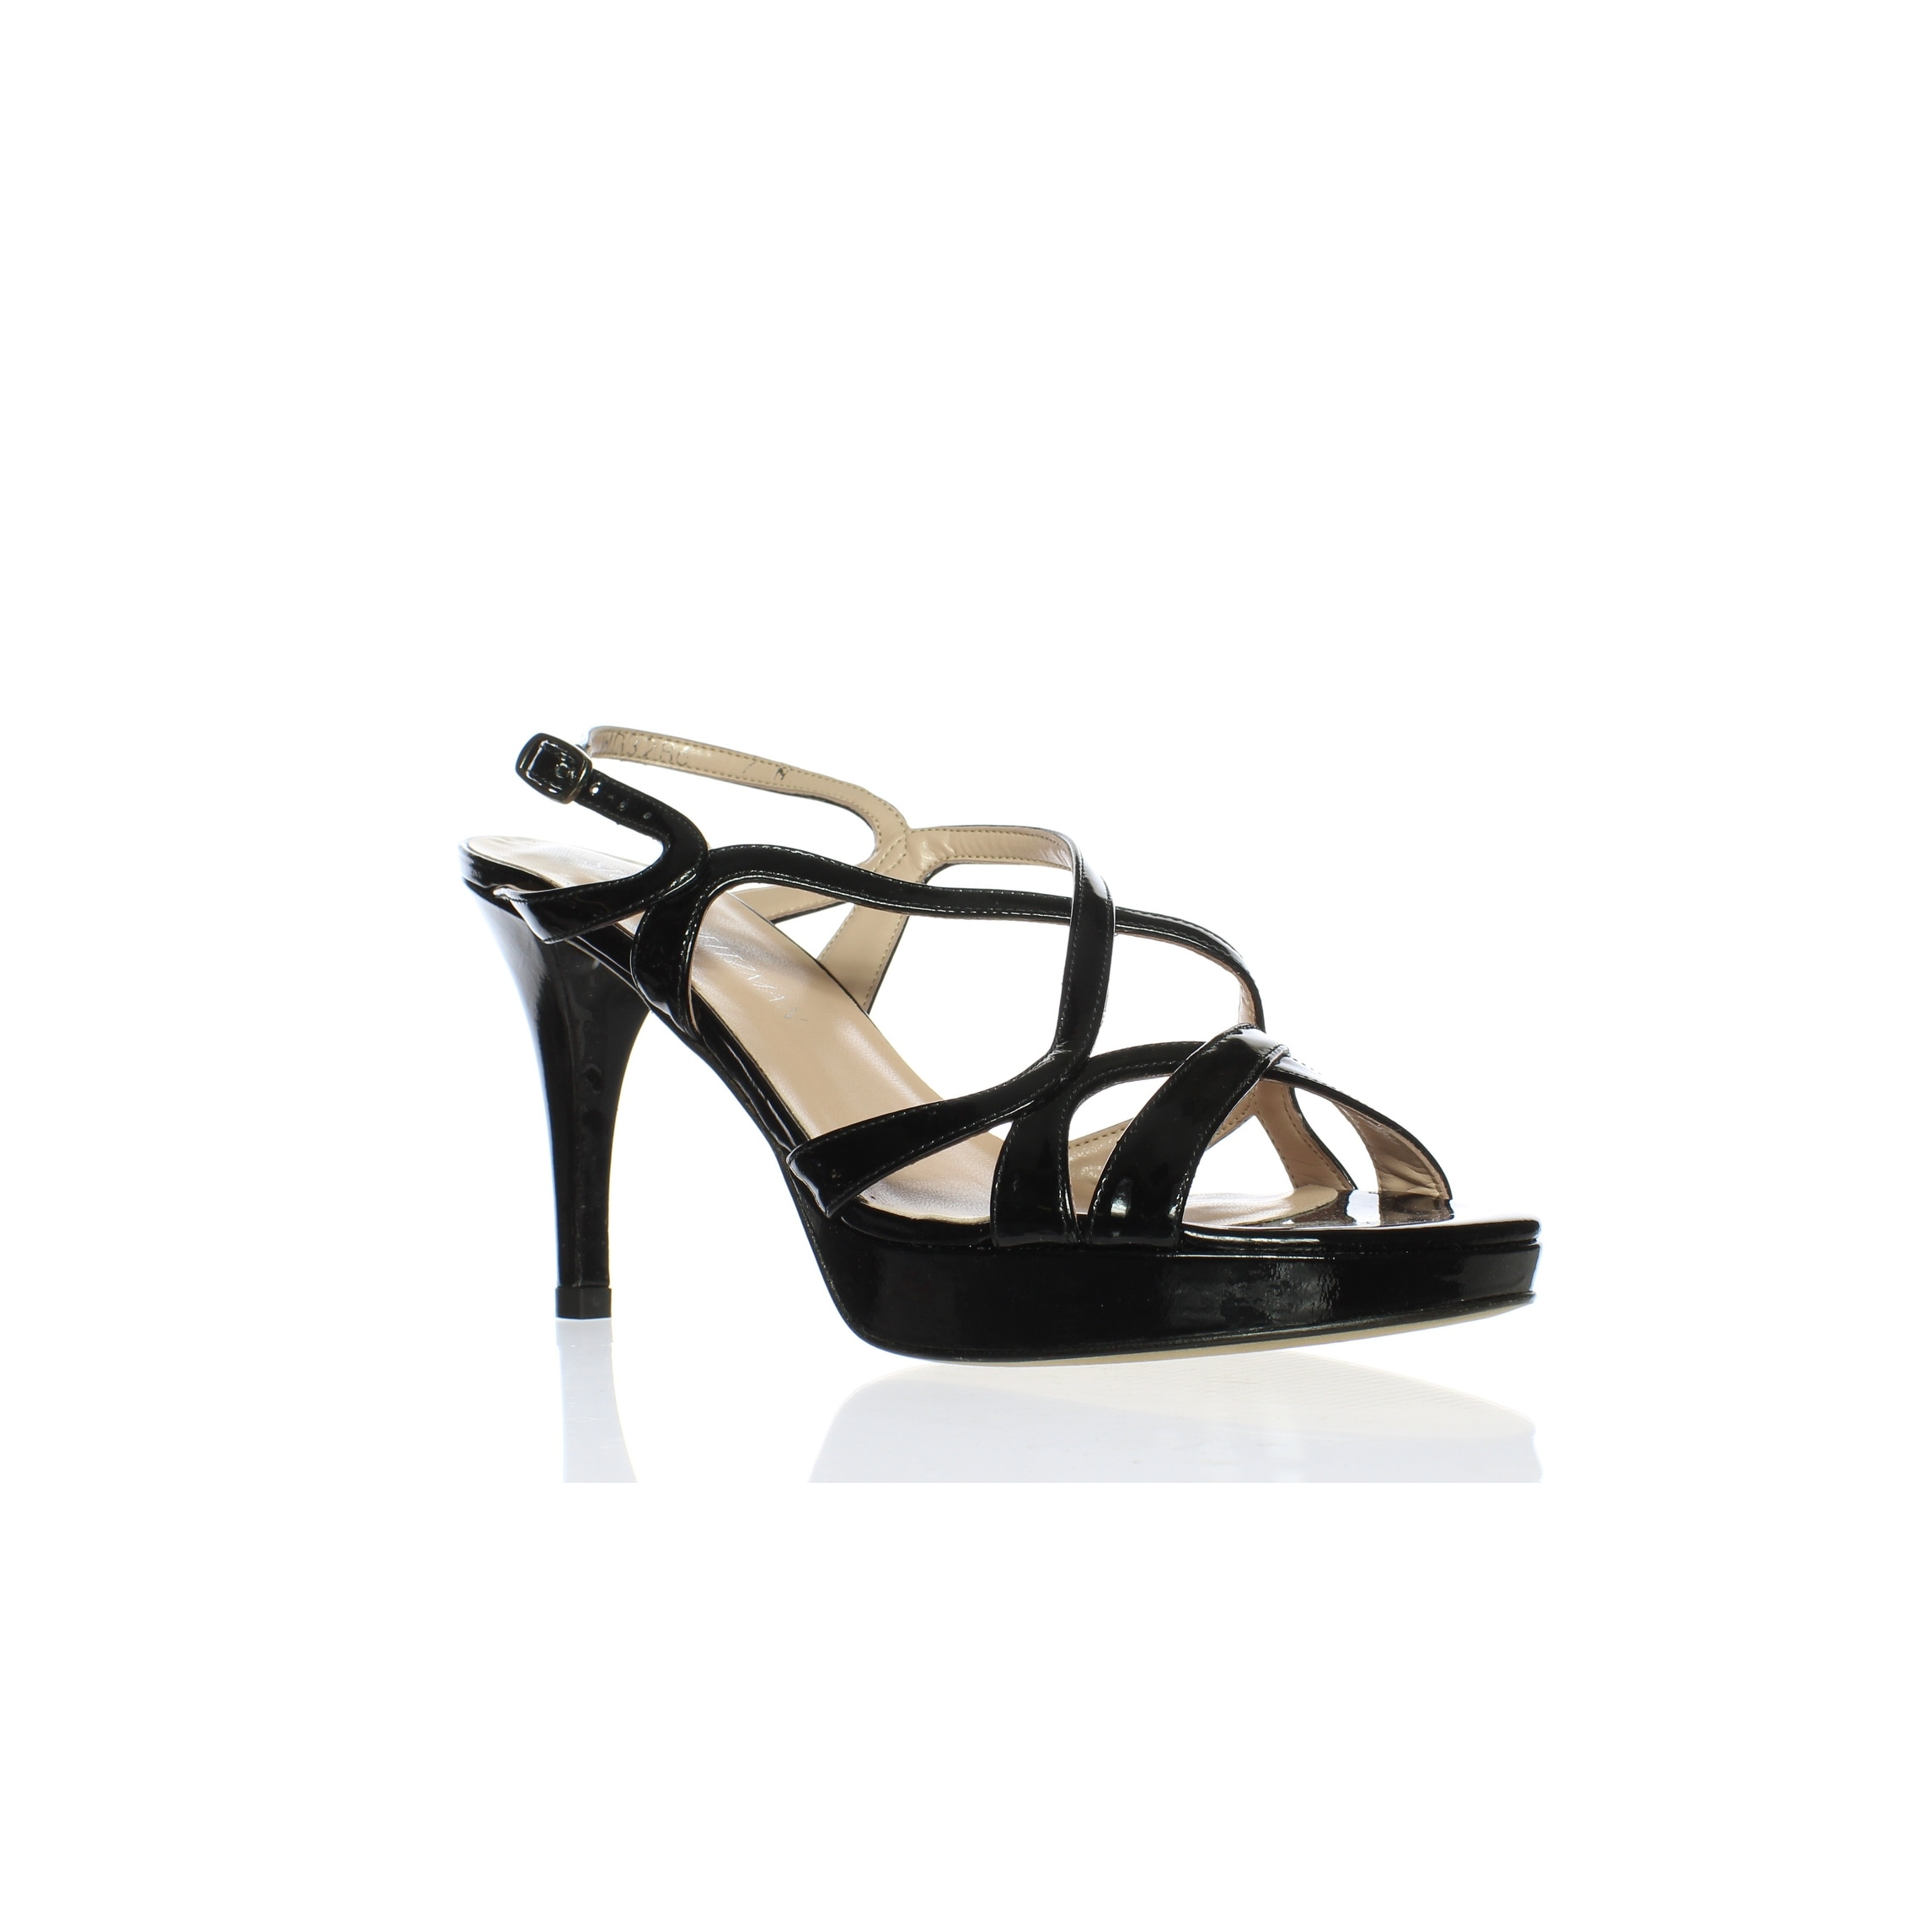 eb0e575d5d Stuart Weitzman Women's Shoes | Find Great Shoes Deals Shopping at Overstock